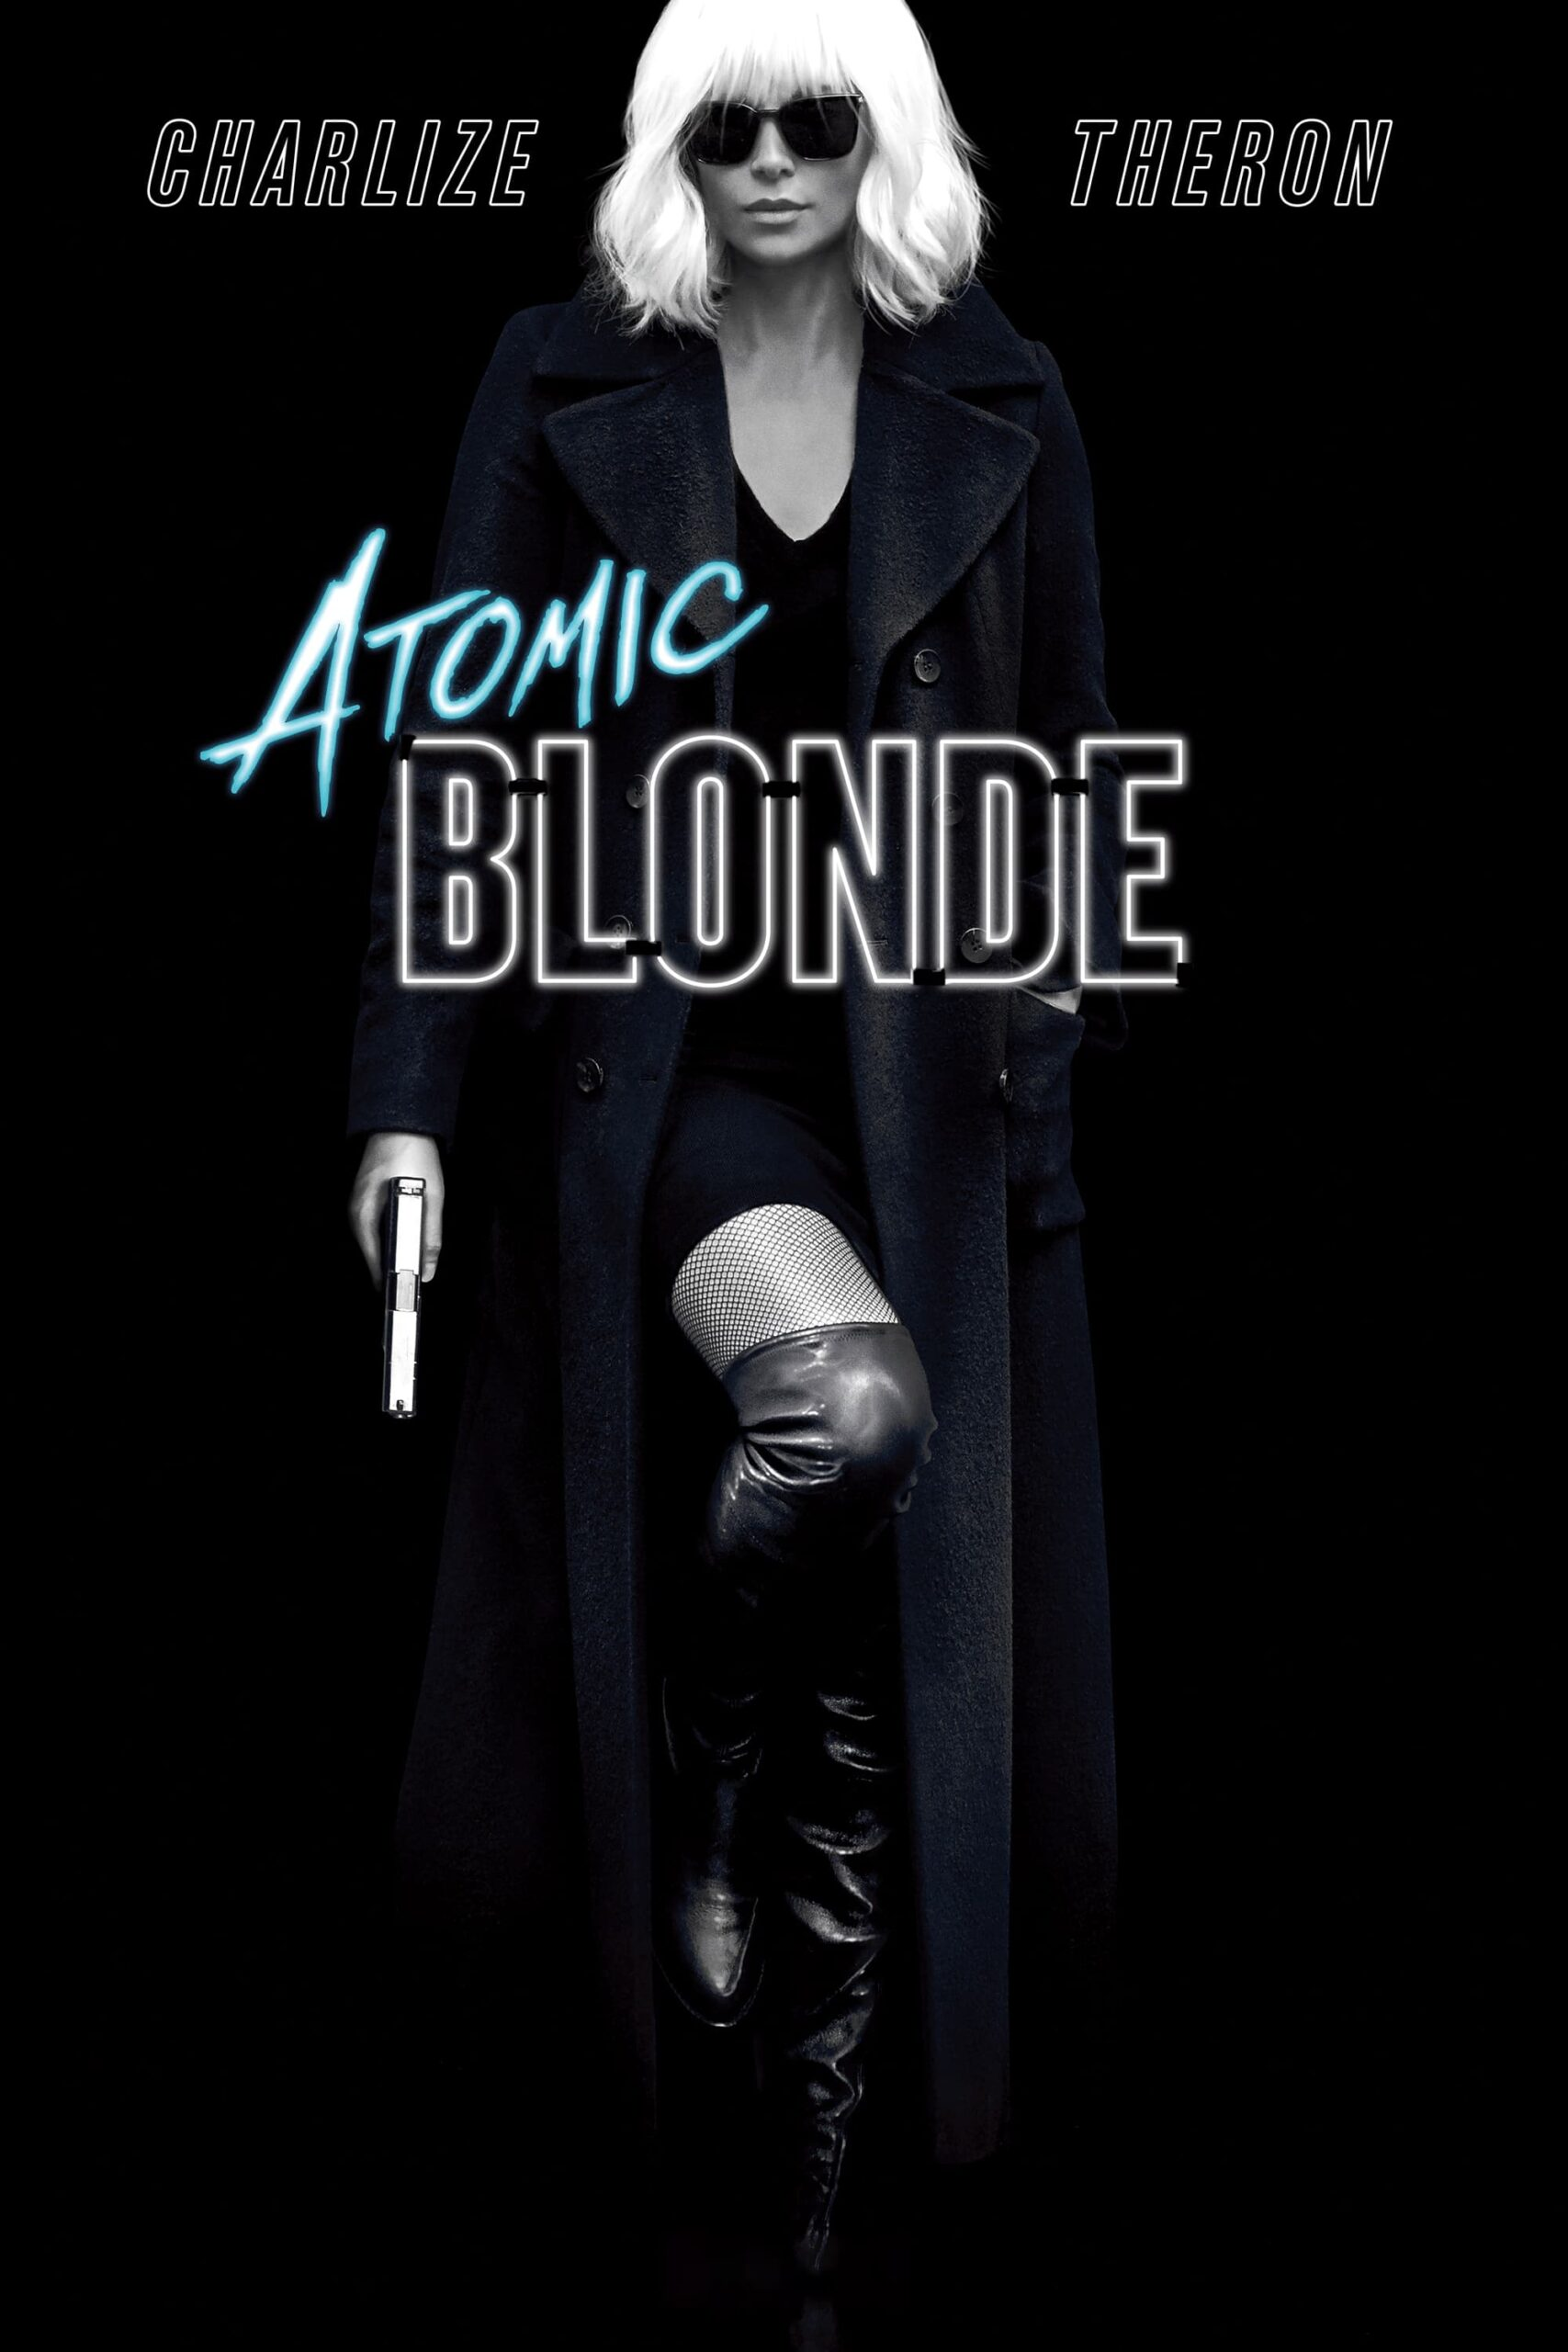 Atomic Blonde Movie Streaming Online